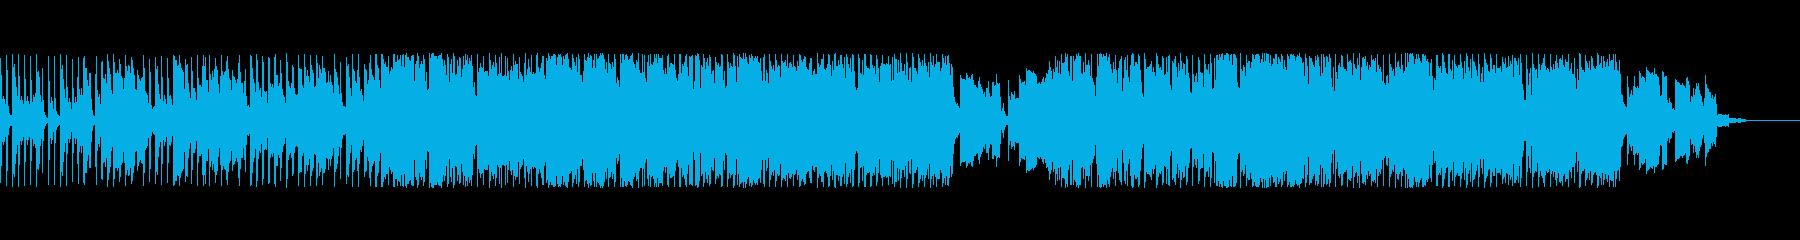 GUITAR BEATER ID ...の再生済みの波形